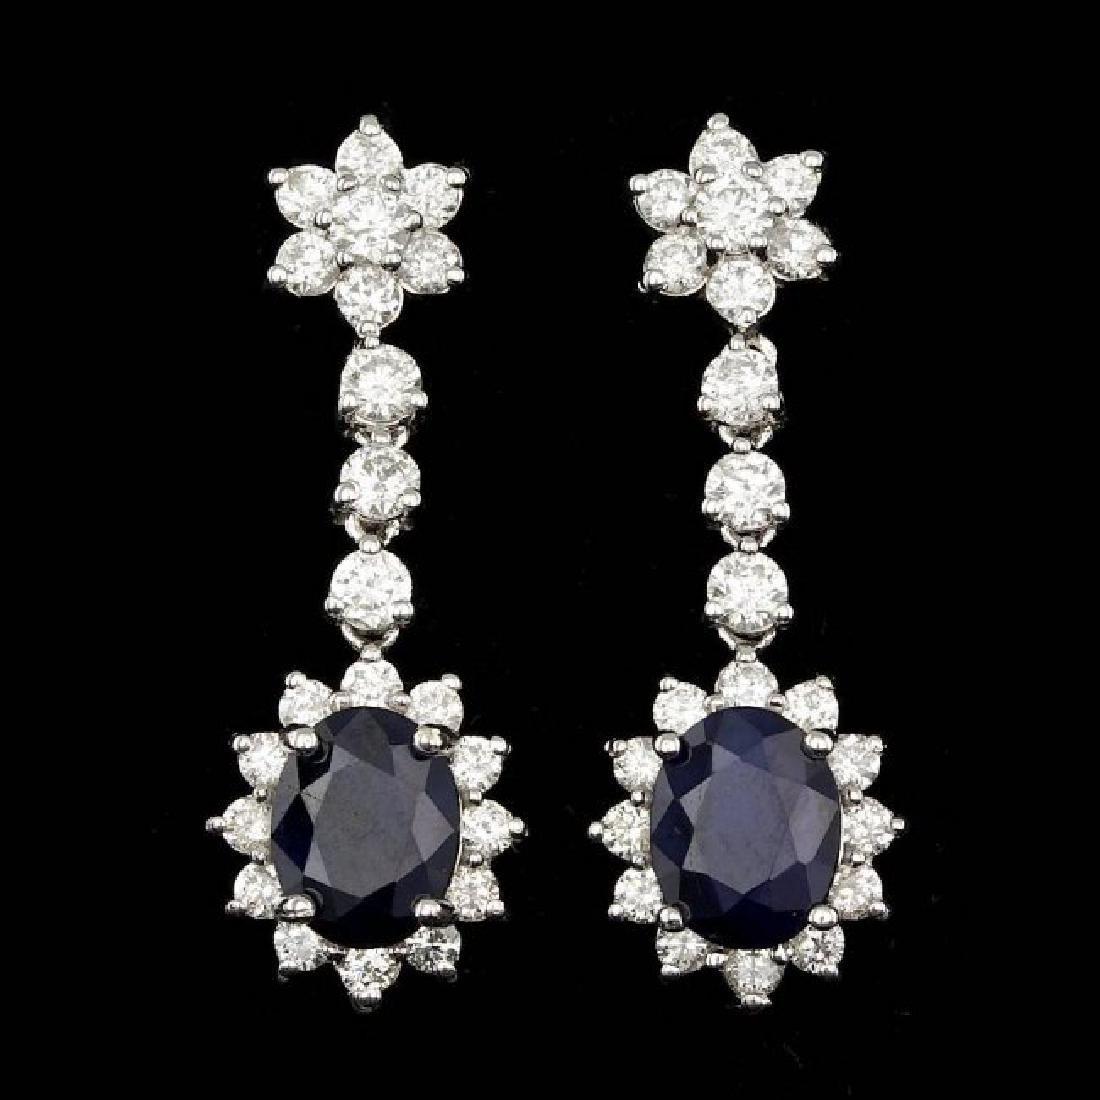 14k Gold 4.50ct Sapphire 2.35ct Diamond Earrings